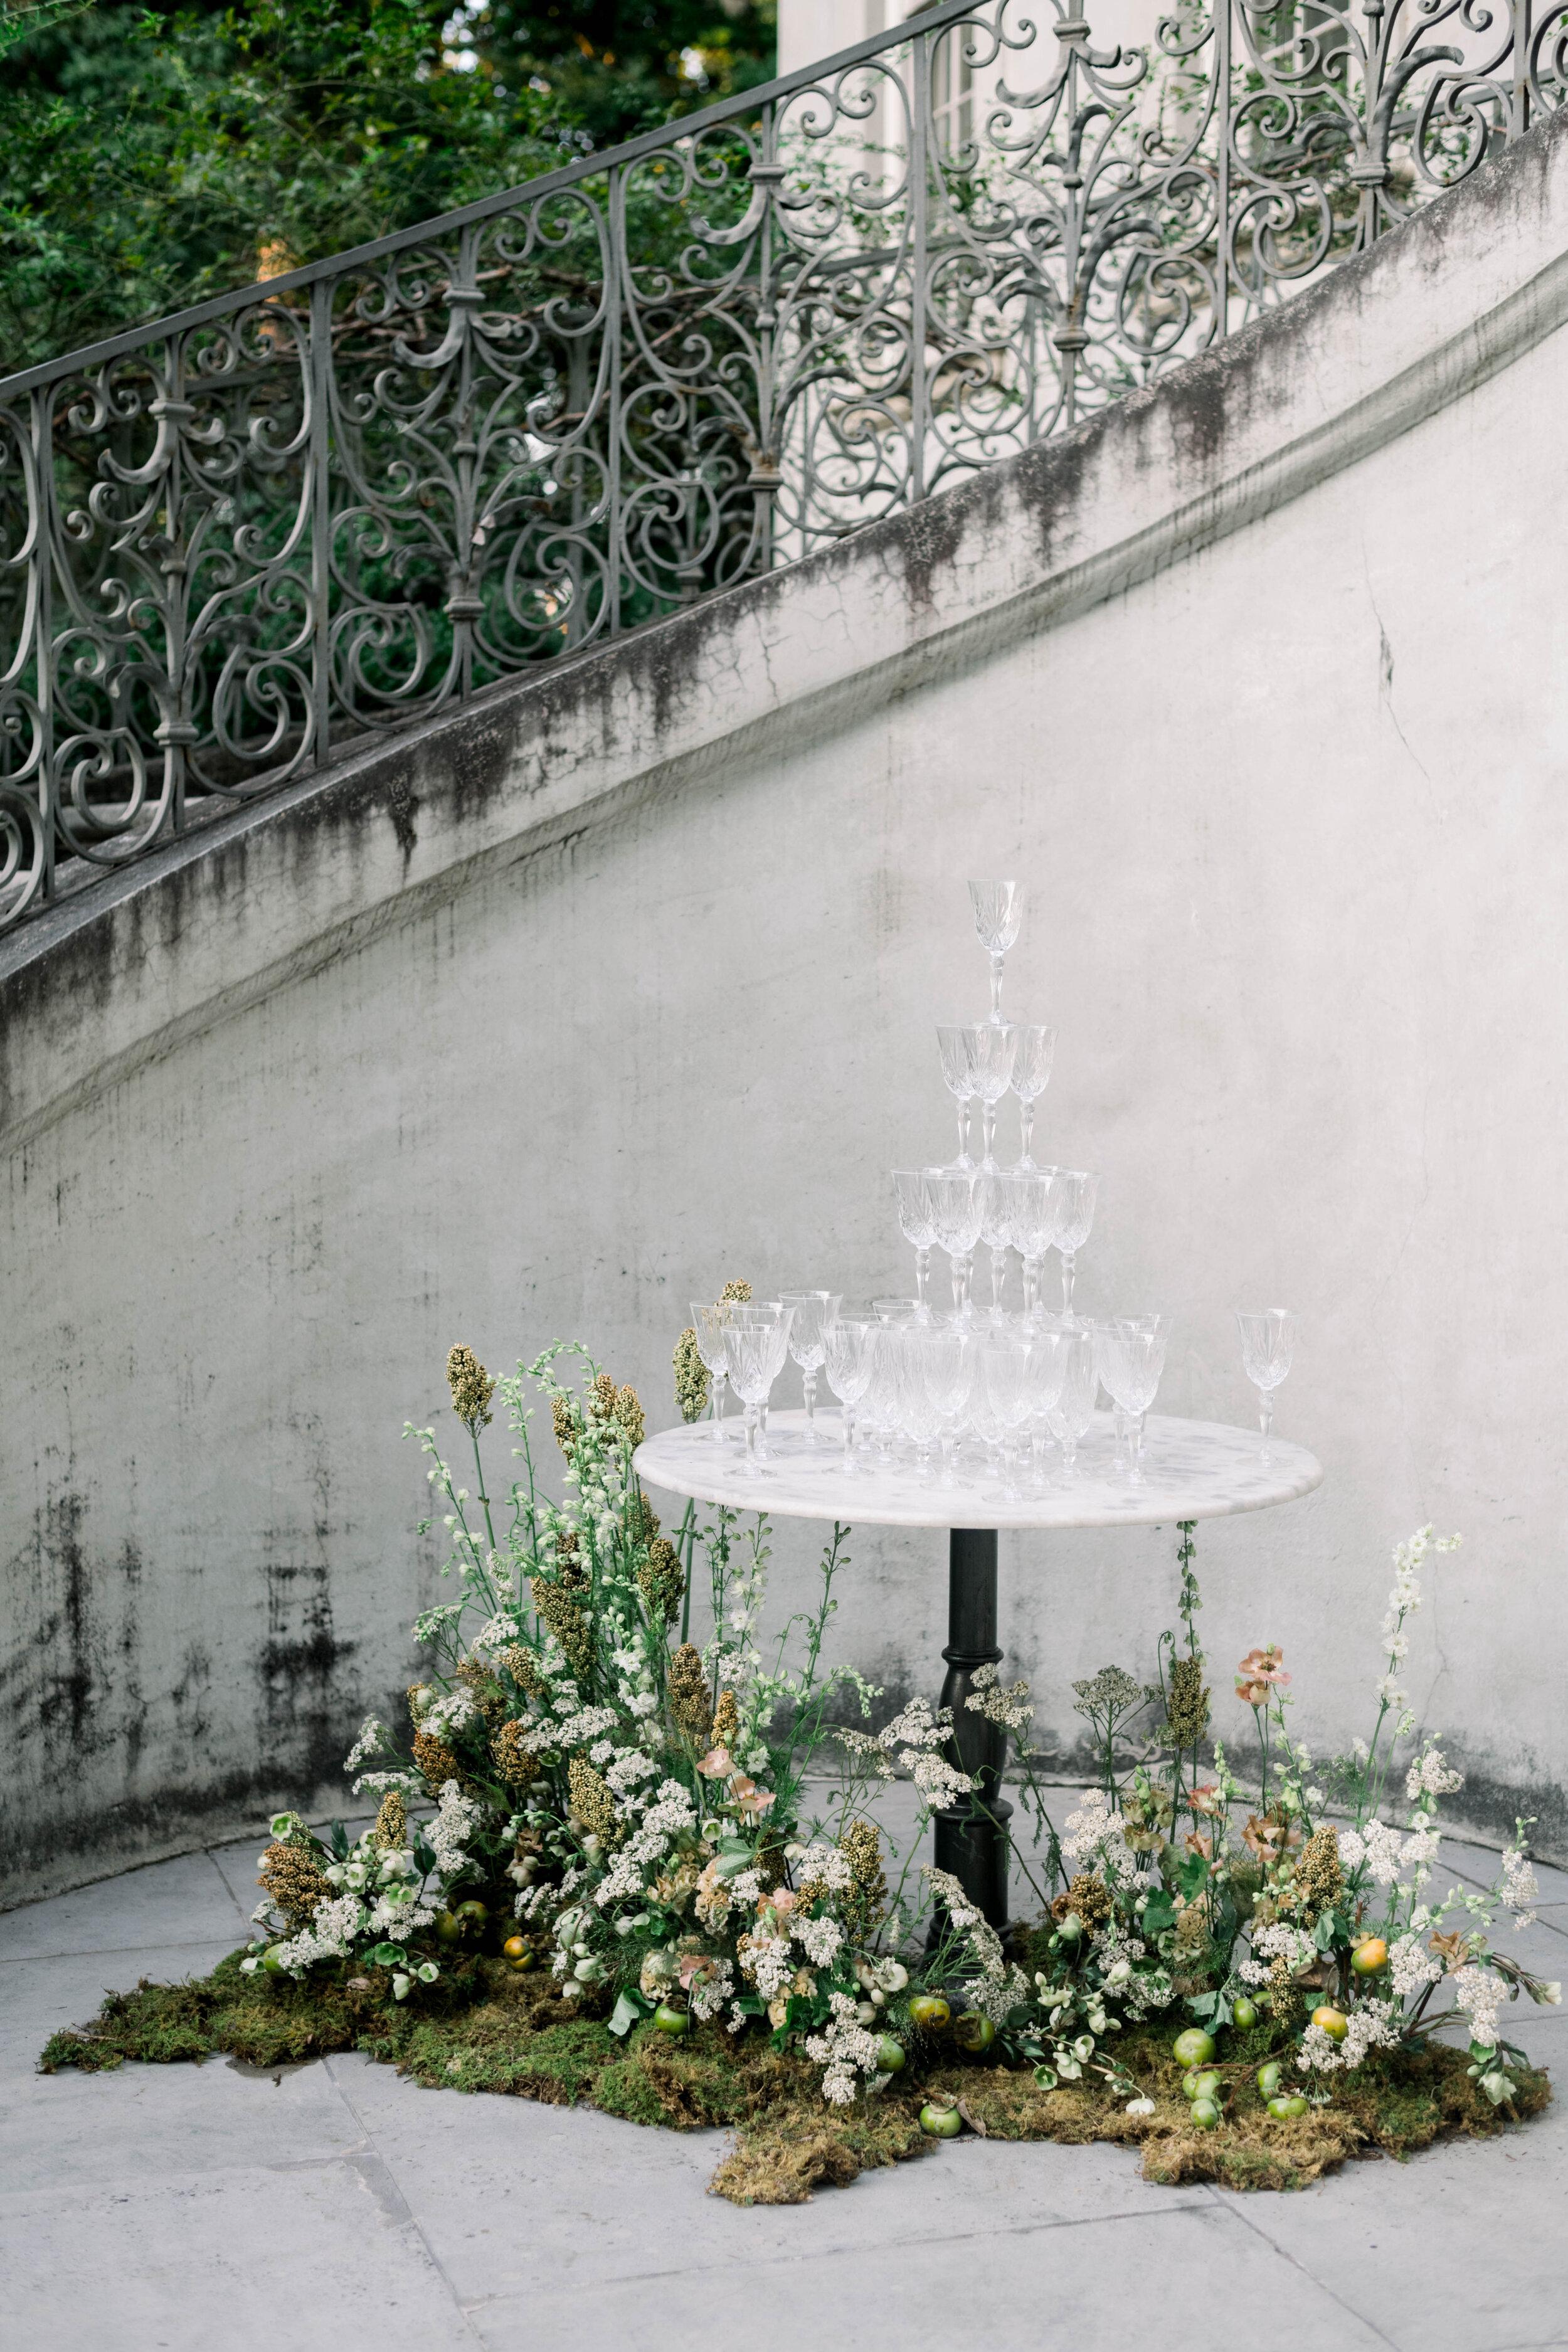 fine art wedding, Atlanta wedding, swan house wedding, modern wedding, rolls Royce wedding, swan house, high neck wedding dress, white tux, champagne toast